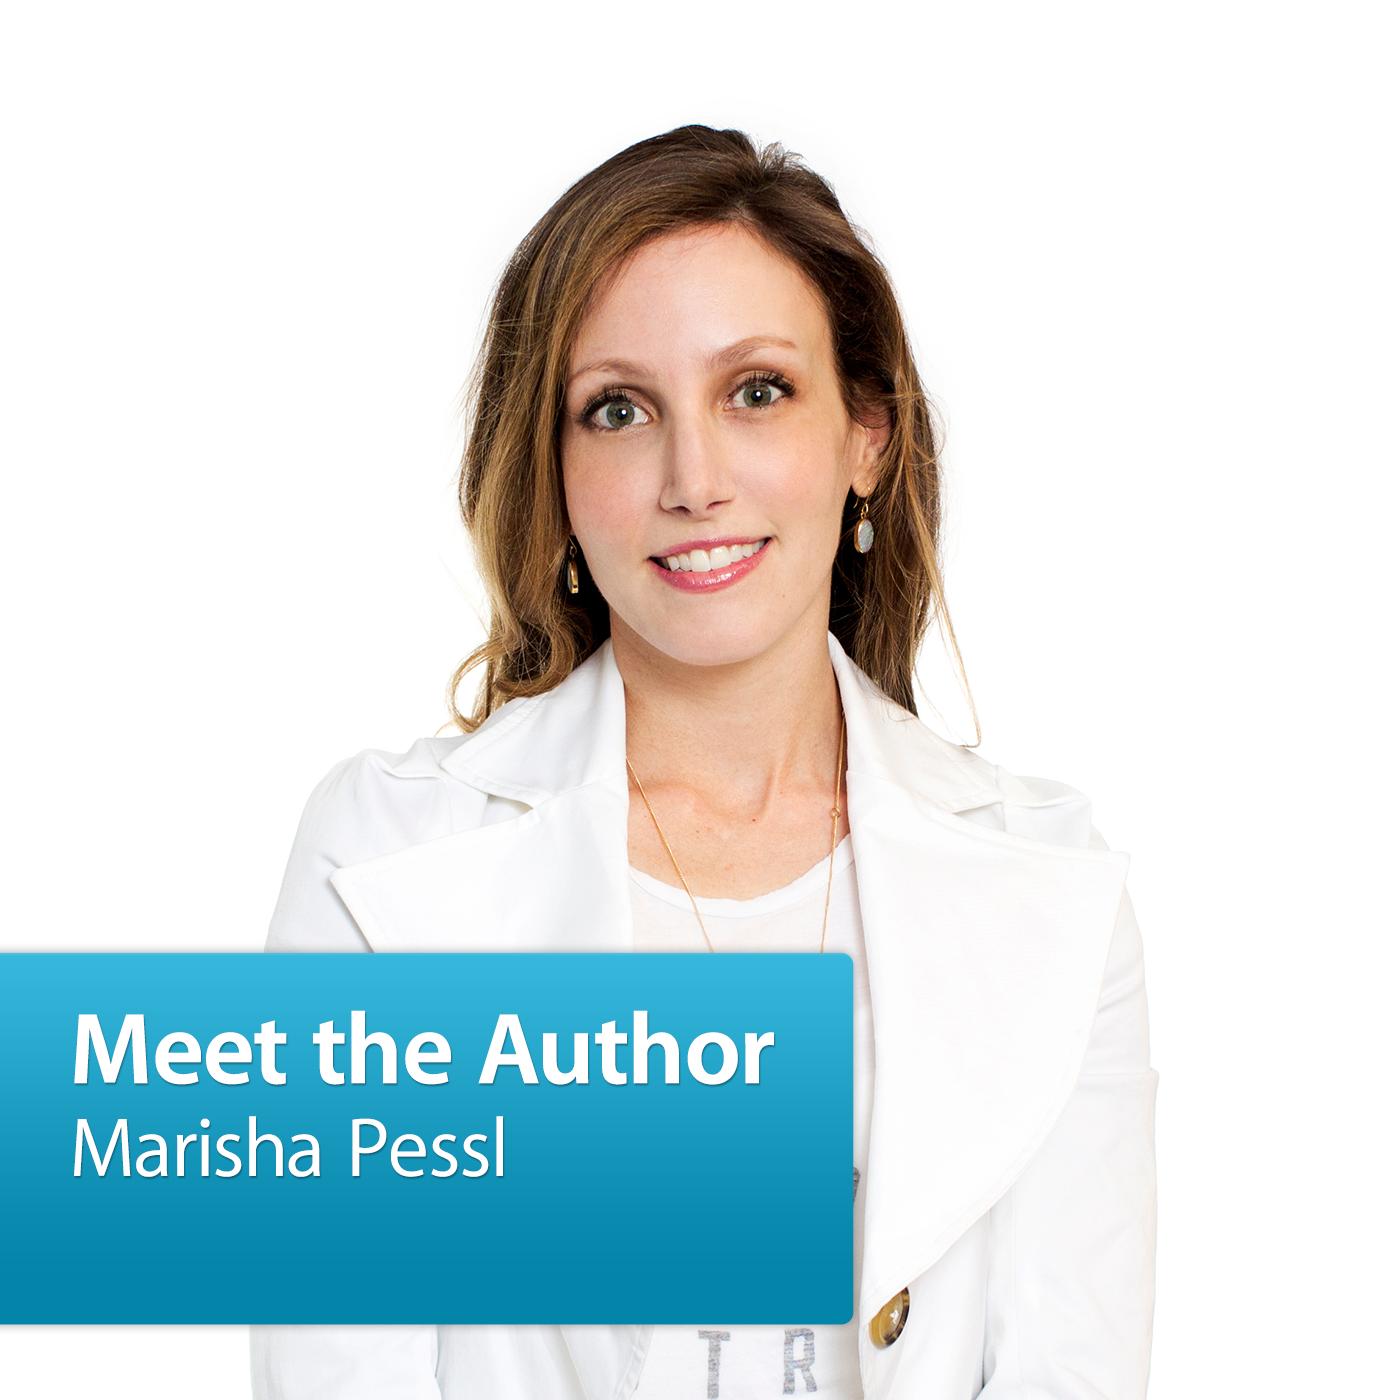 Marisha Pessl: Meet the Author